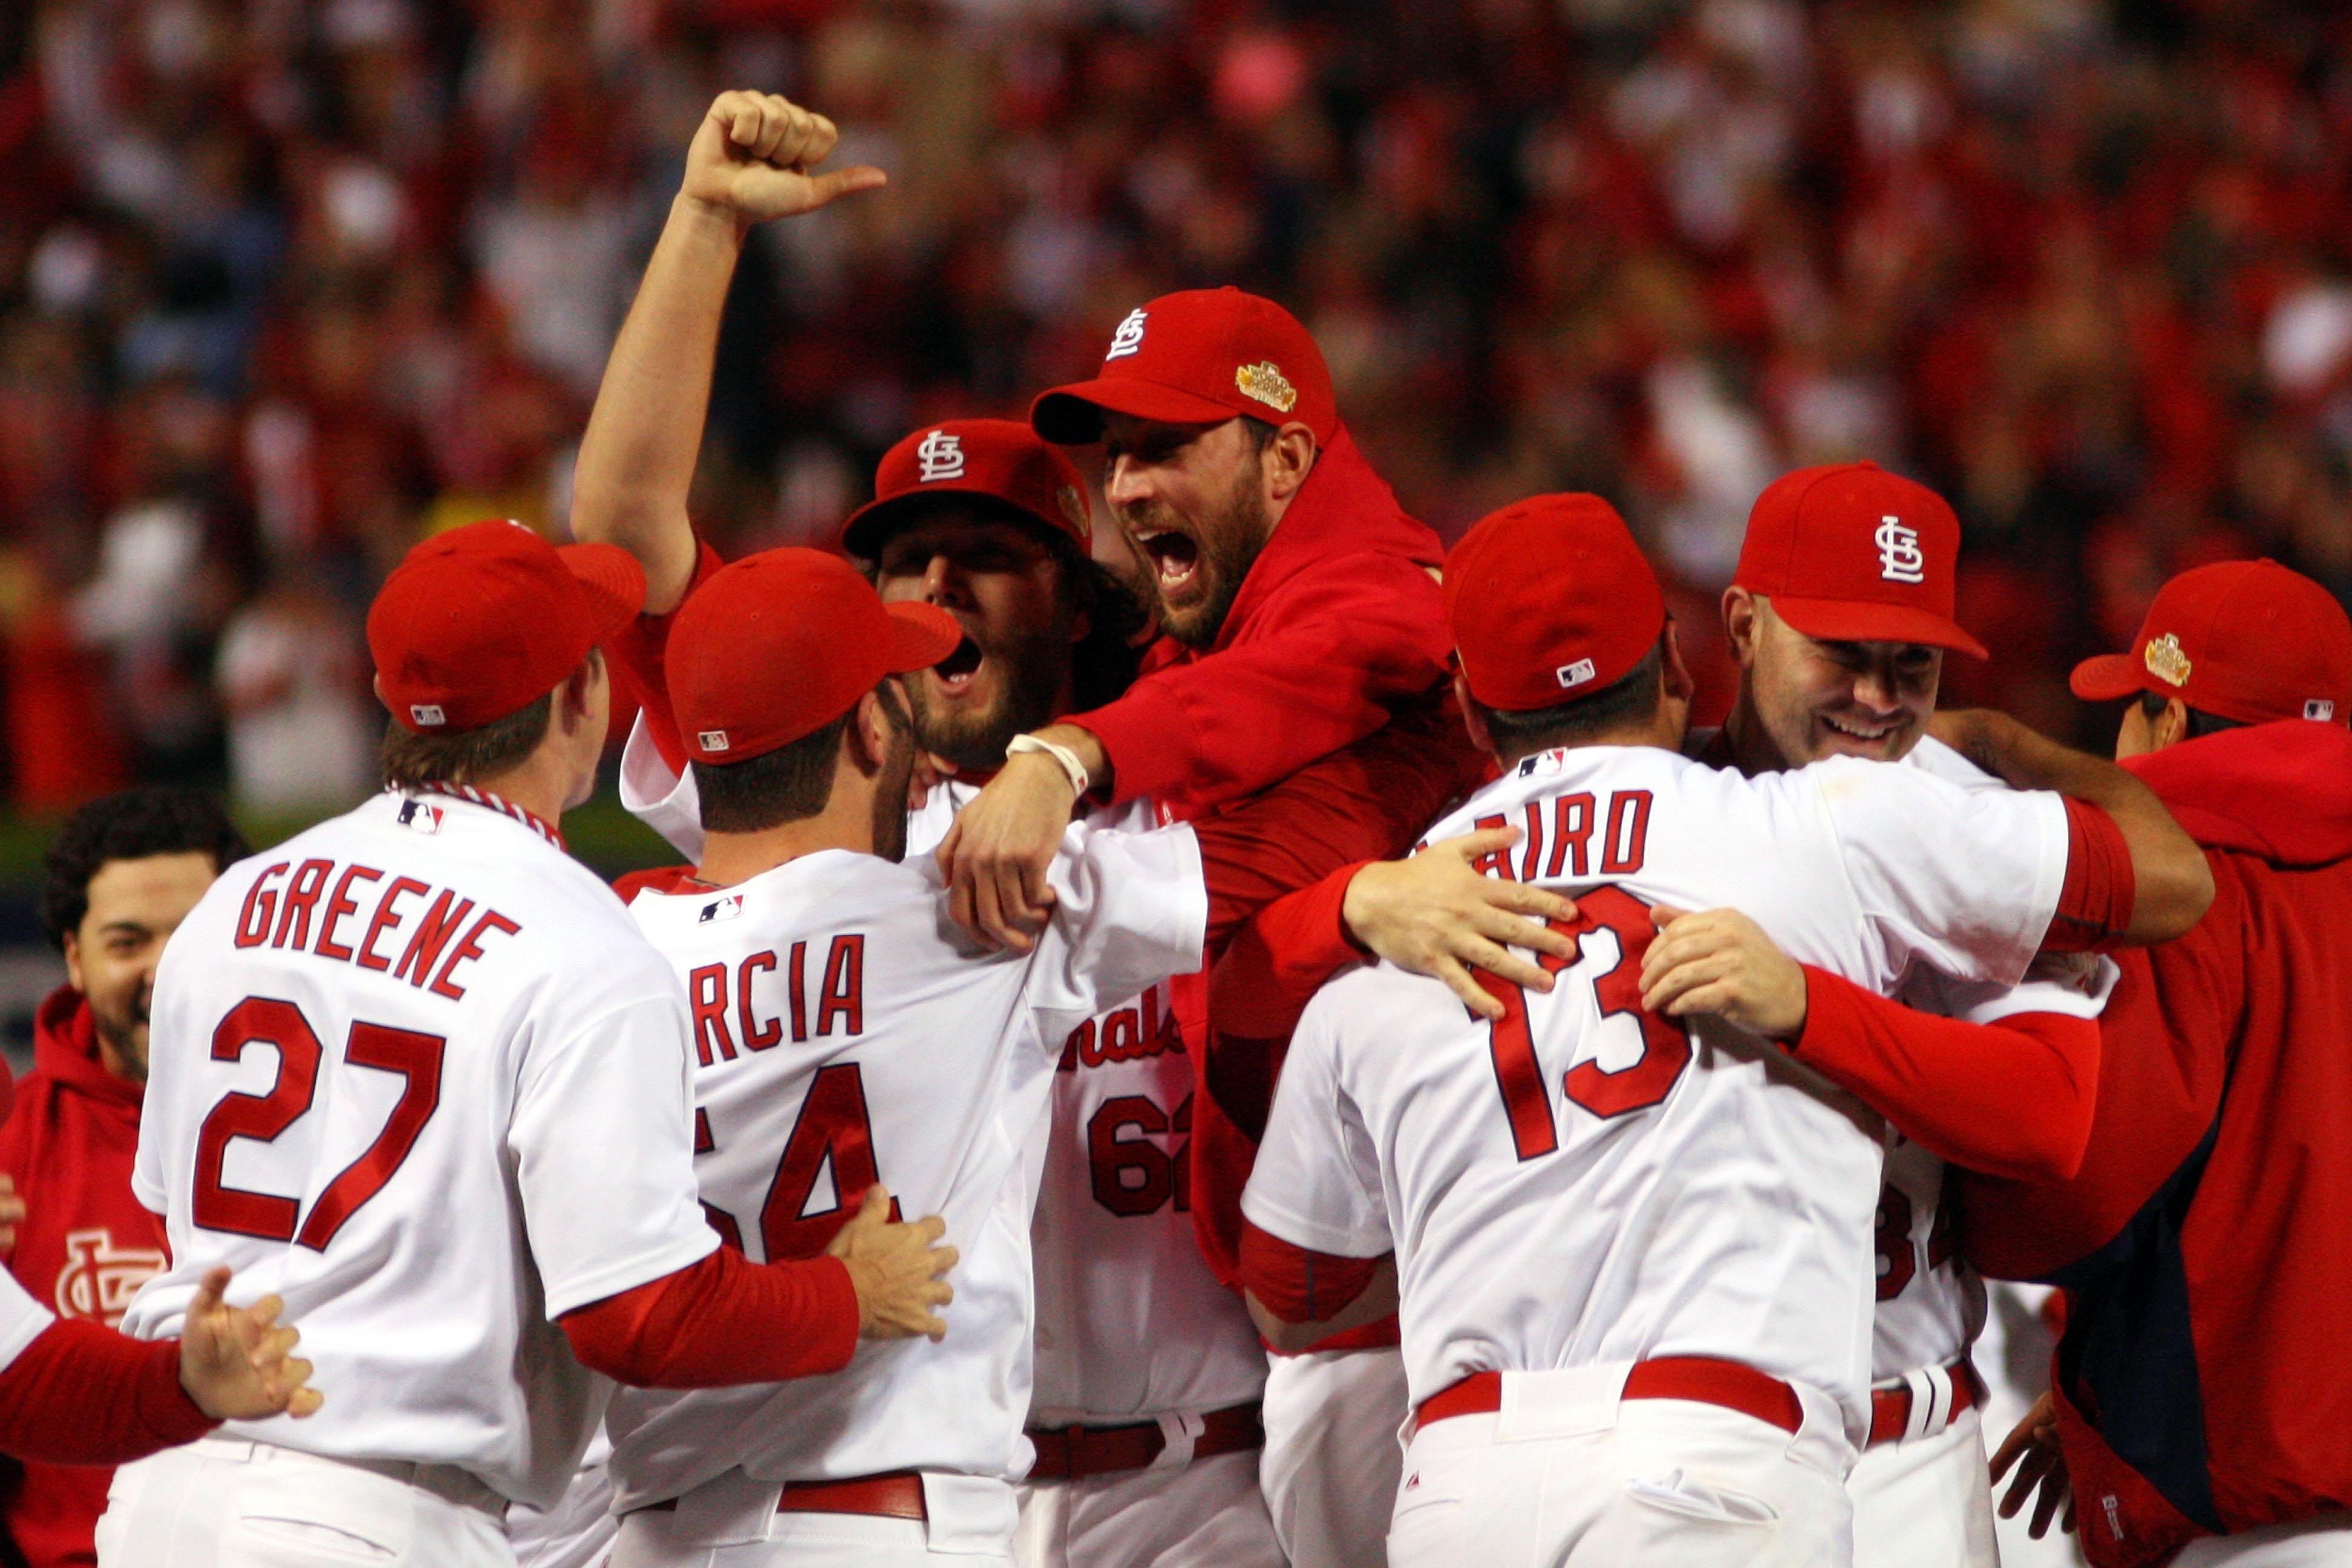 2011 World Series Game 7 - Texas Rangers v St Louis Cardinals